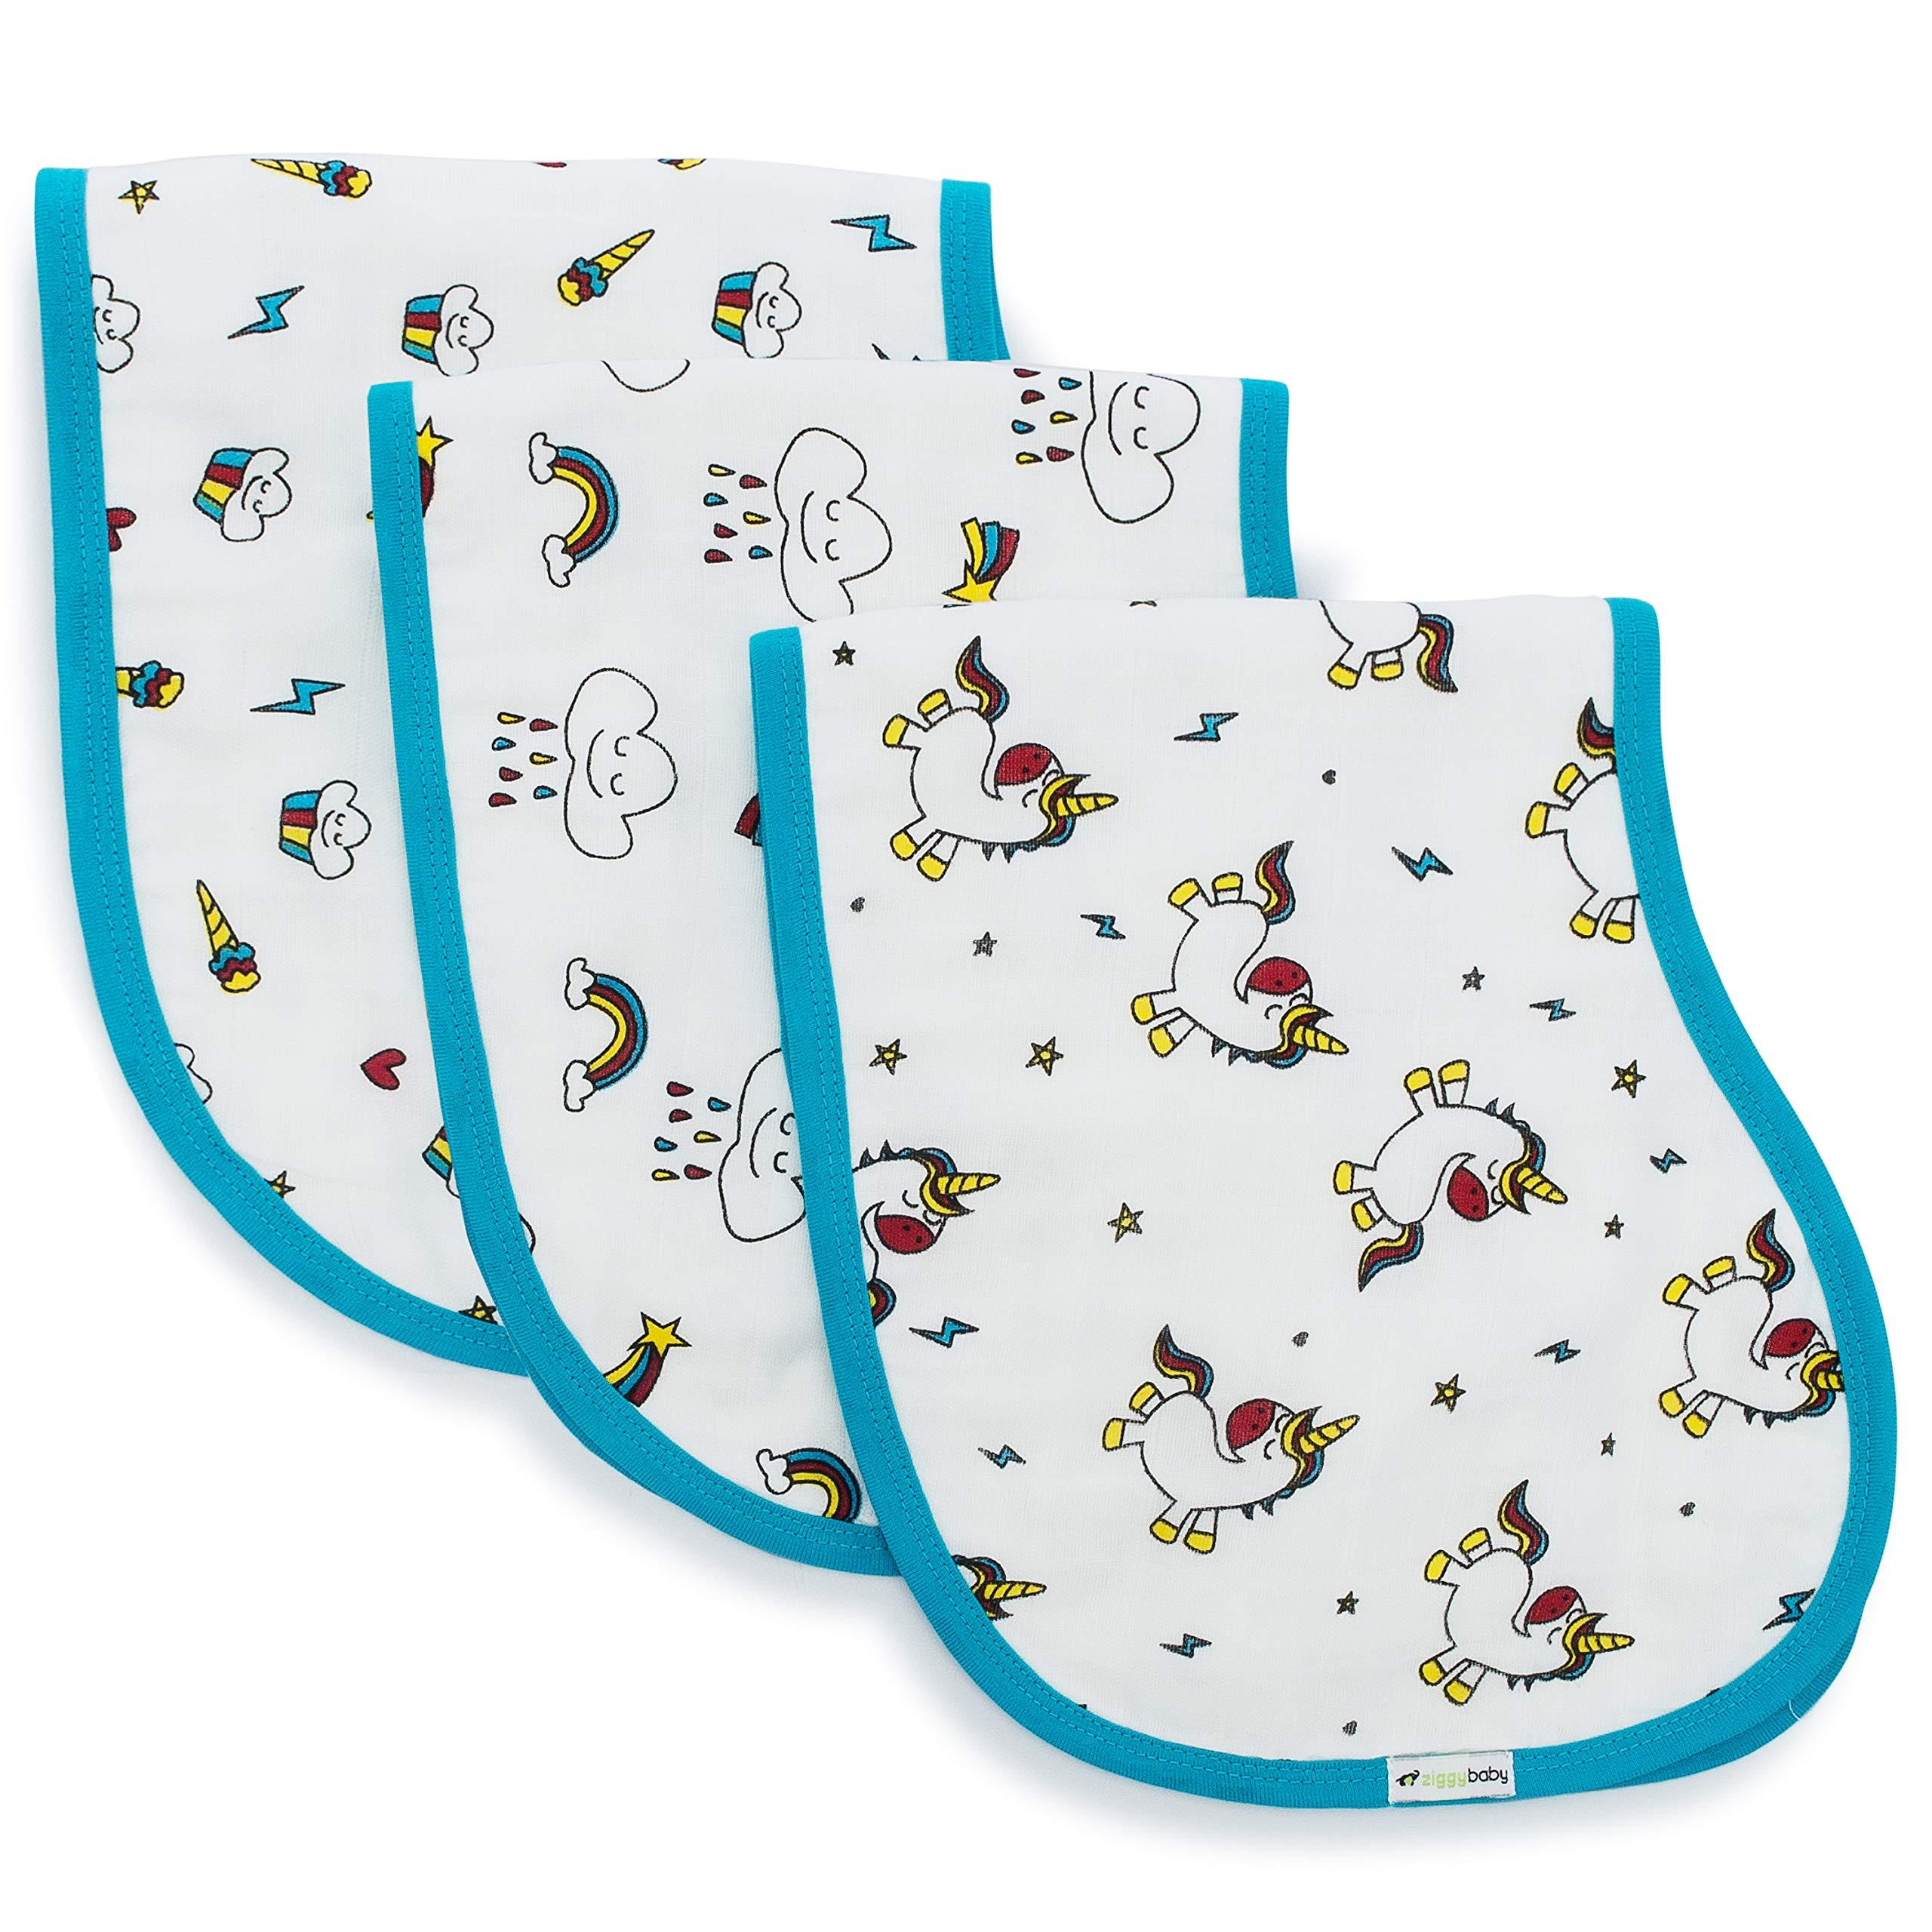 Muslin Burp Cloths, Burpy Bib Set (3 Pack) Unicorn, Rainbow, Cupcake by Ziggy Baby